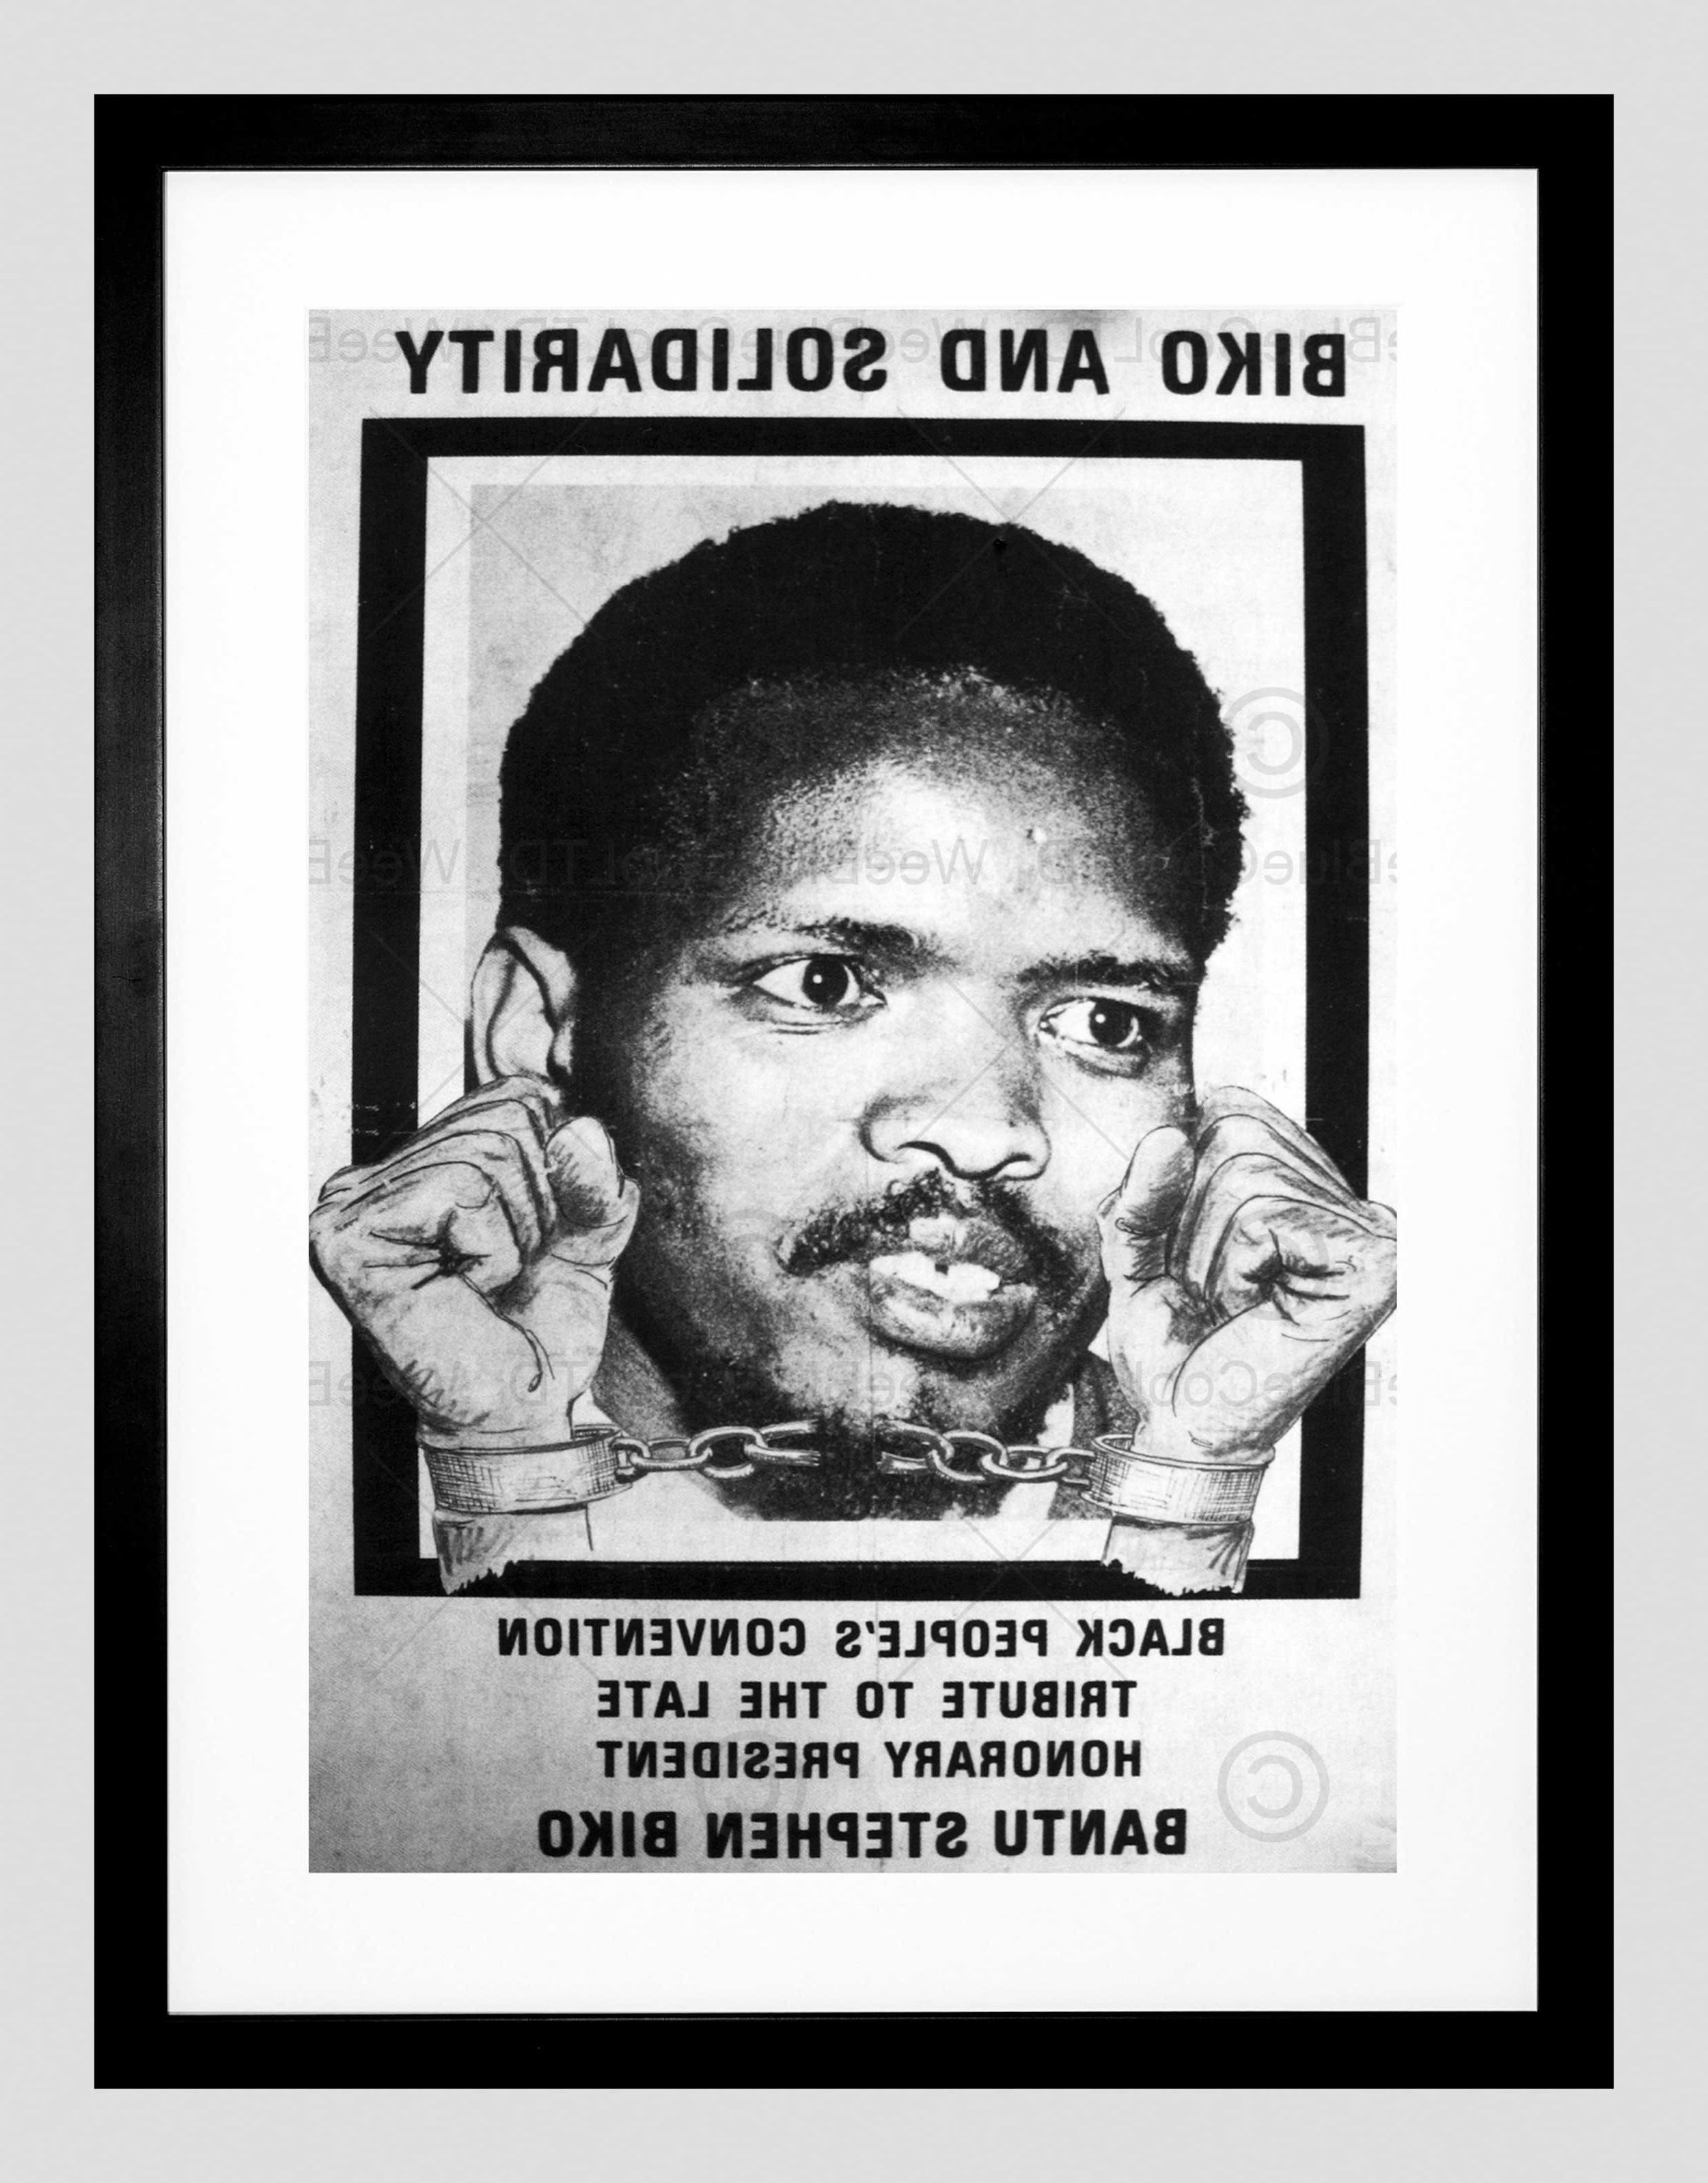 Trendy Political Steve Biko Anc Apartheid South Africa Framed Art Print Pertaining To South Africa Framed Art Prints (Gallery 4 of 15)